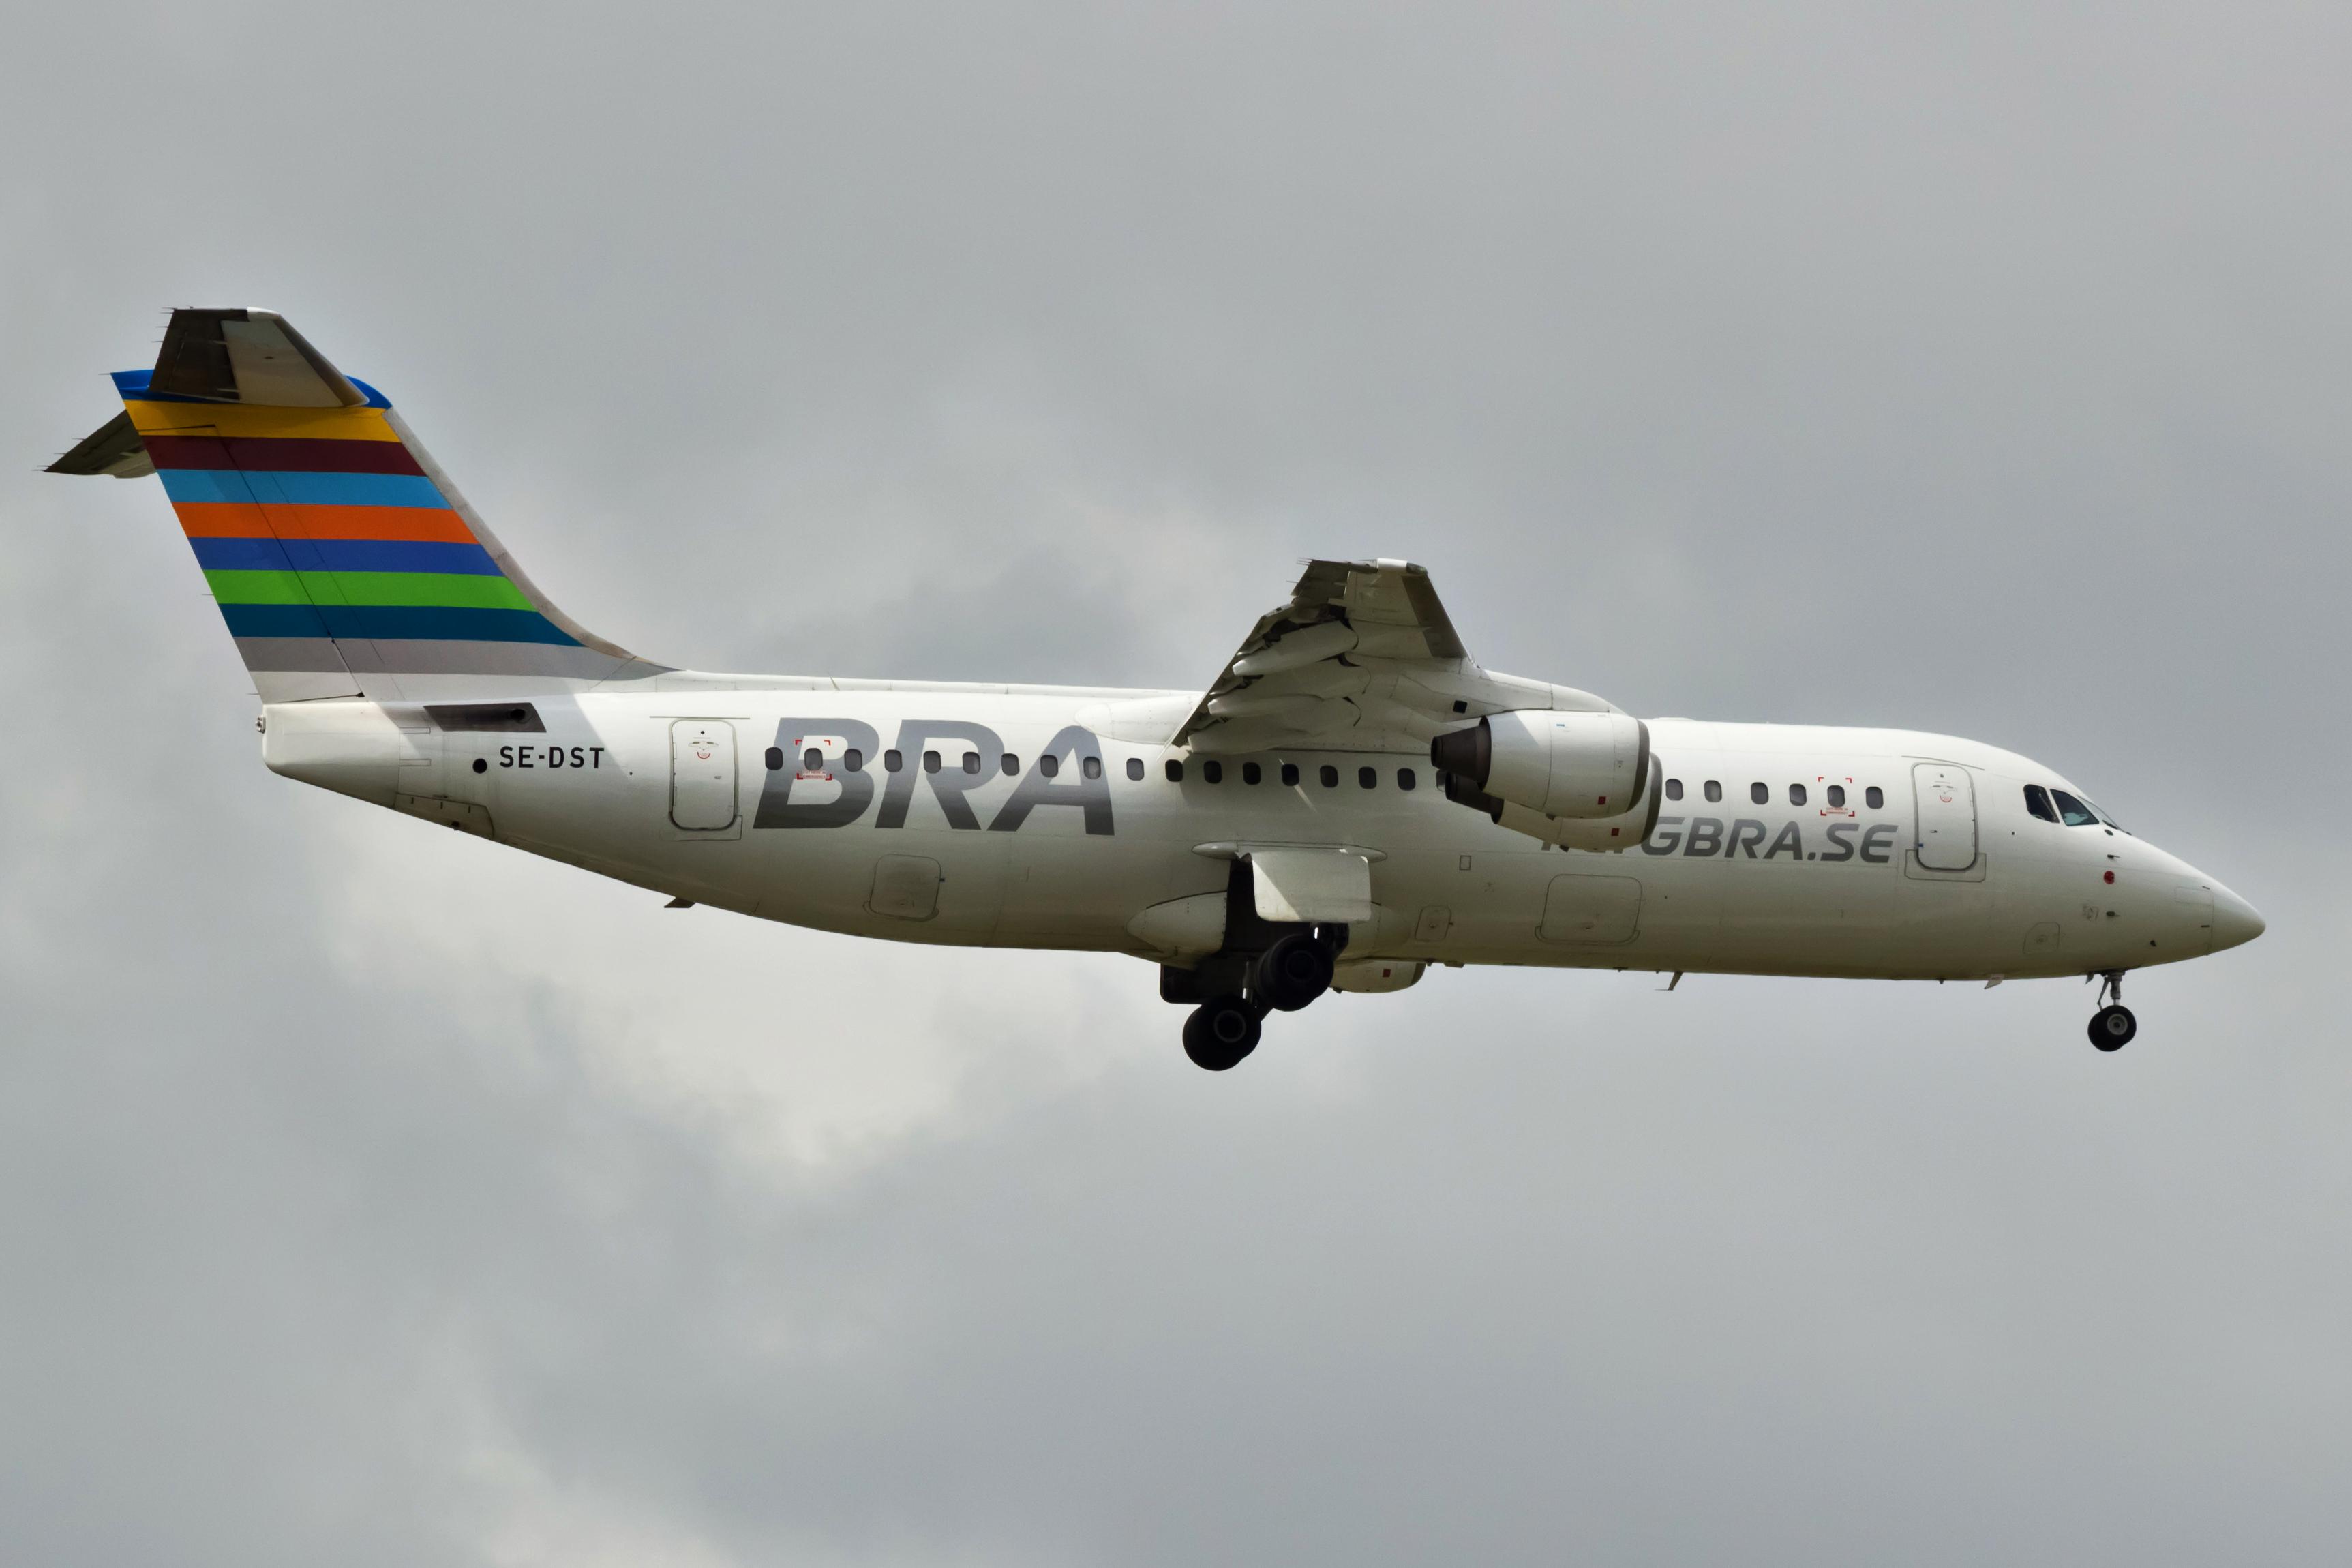 Et søsterfly til det Avro RJ-100 fly, som var involveret i hændelsen. Foto: Bene Riobó / Wikimedia Commons.